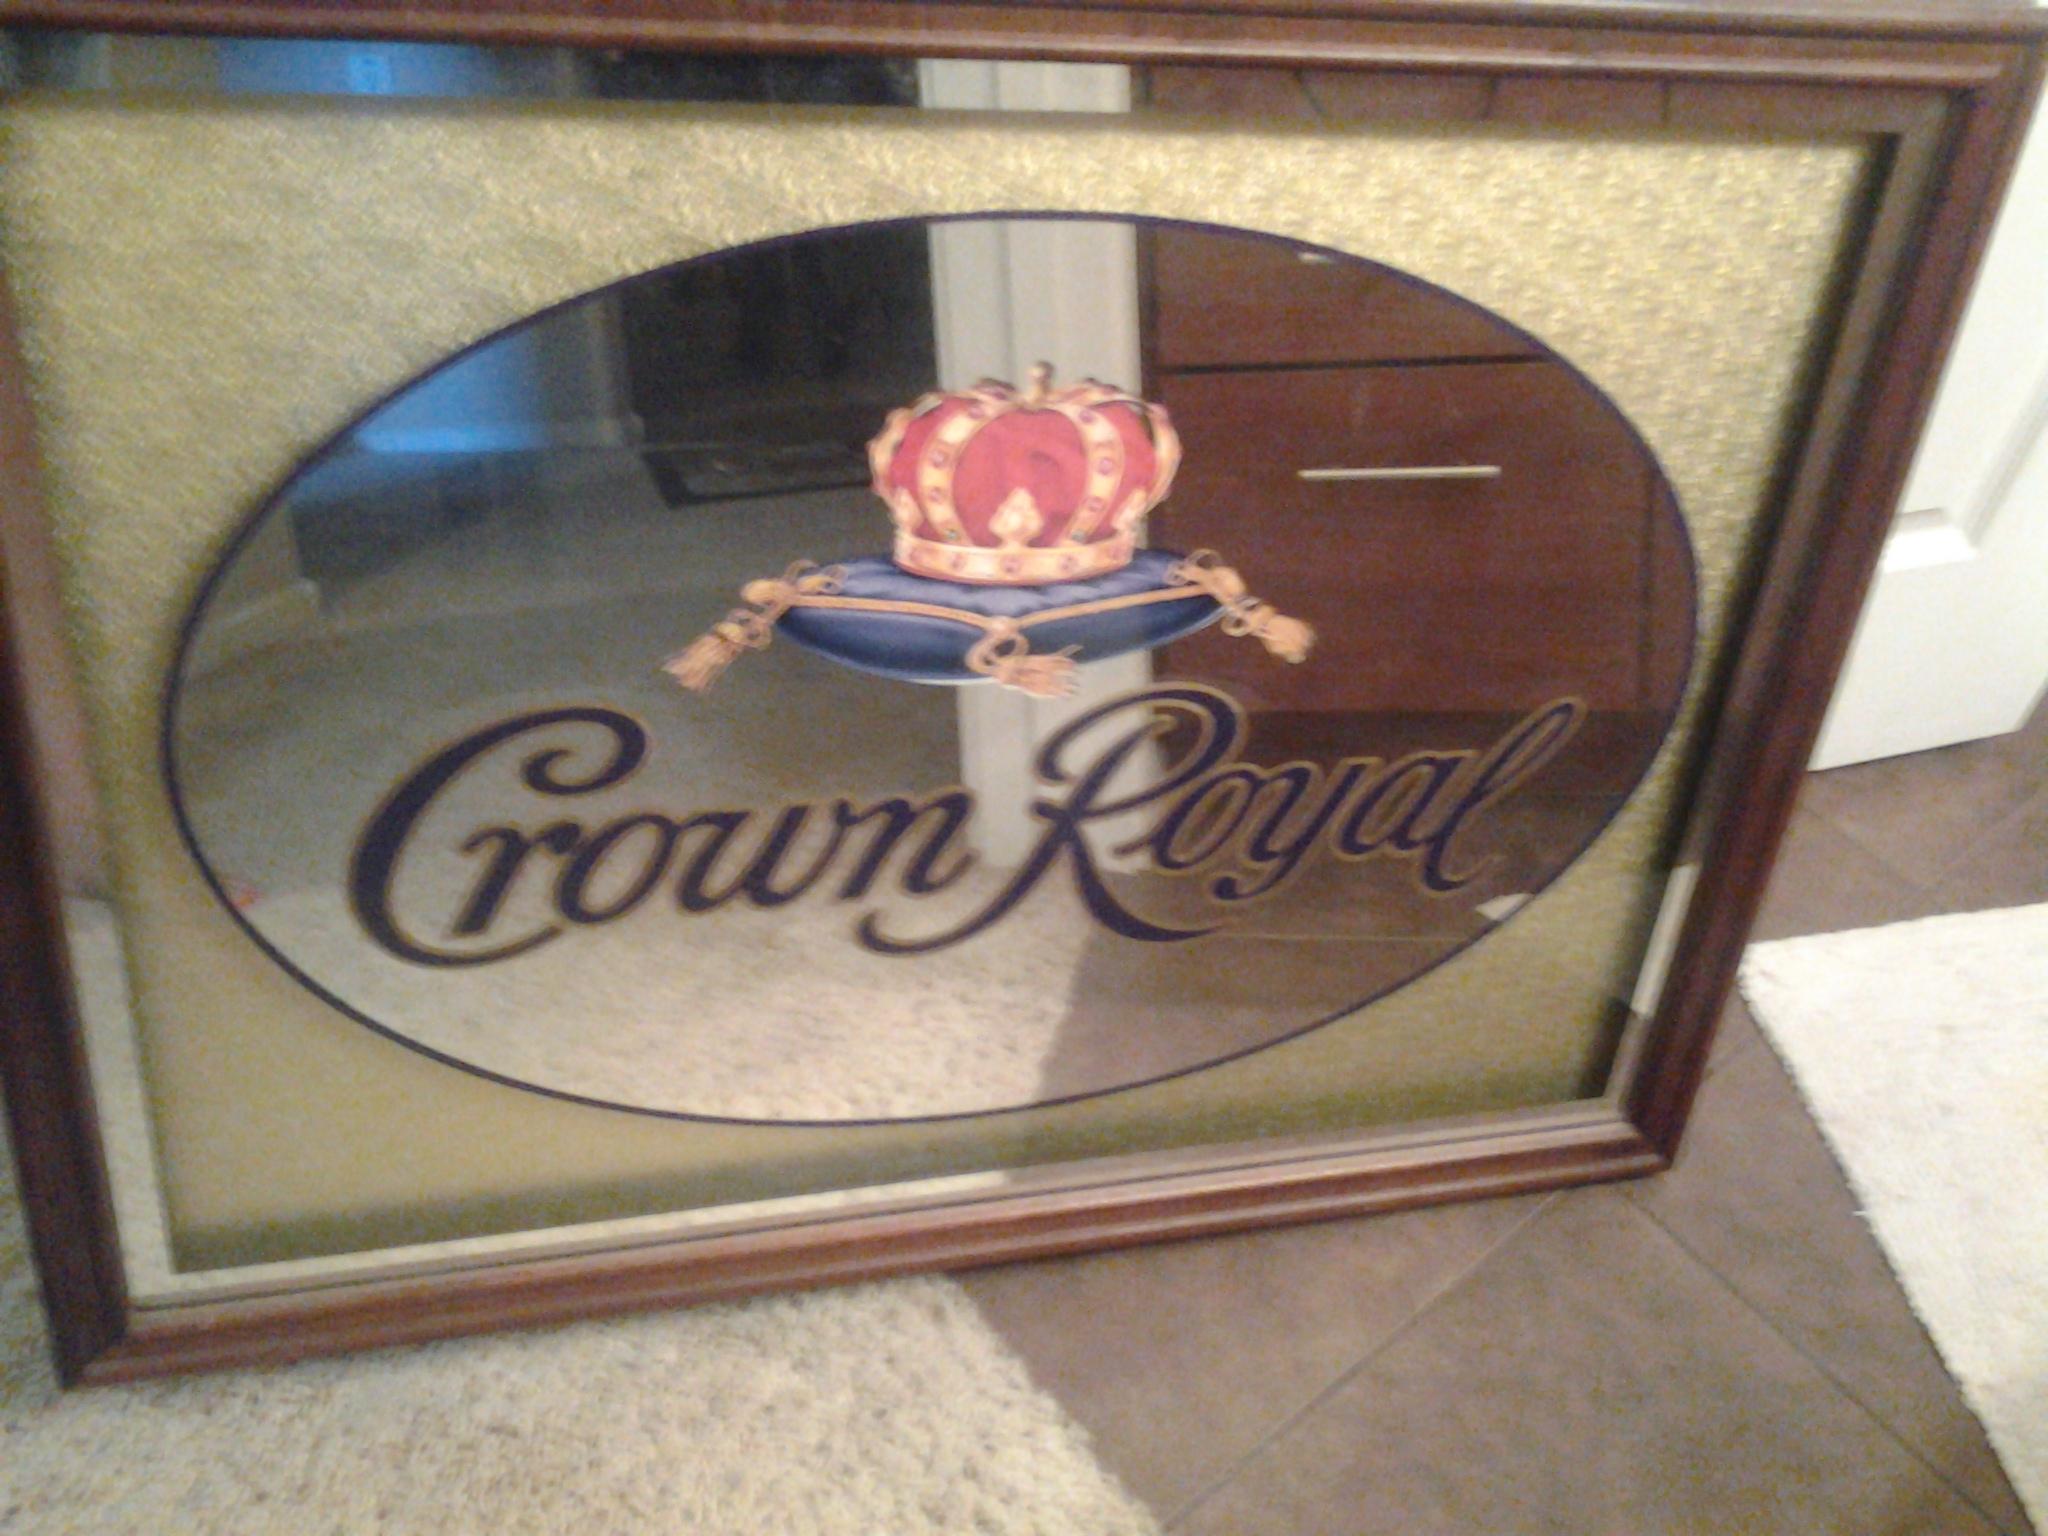 Crown Royal Mirror antique appraisal | InstAppraisal